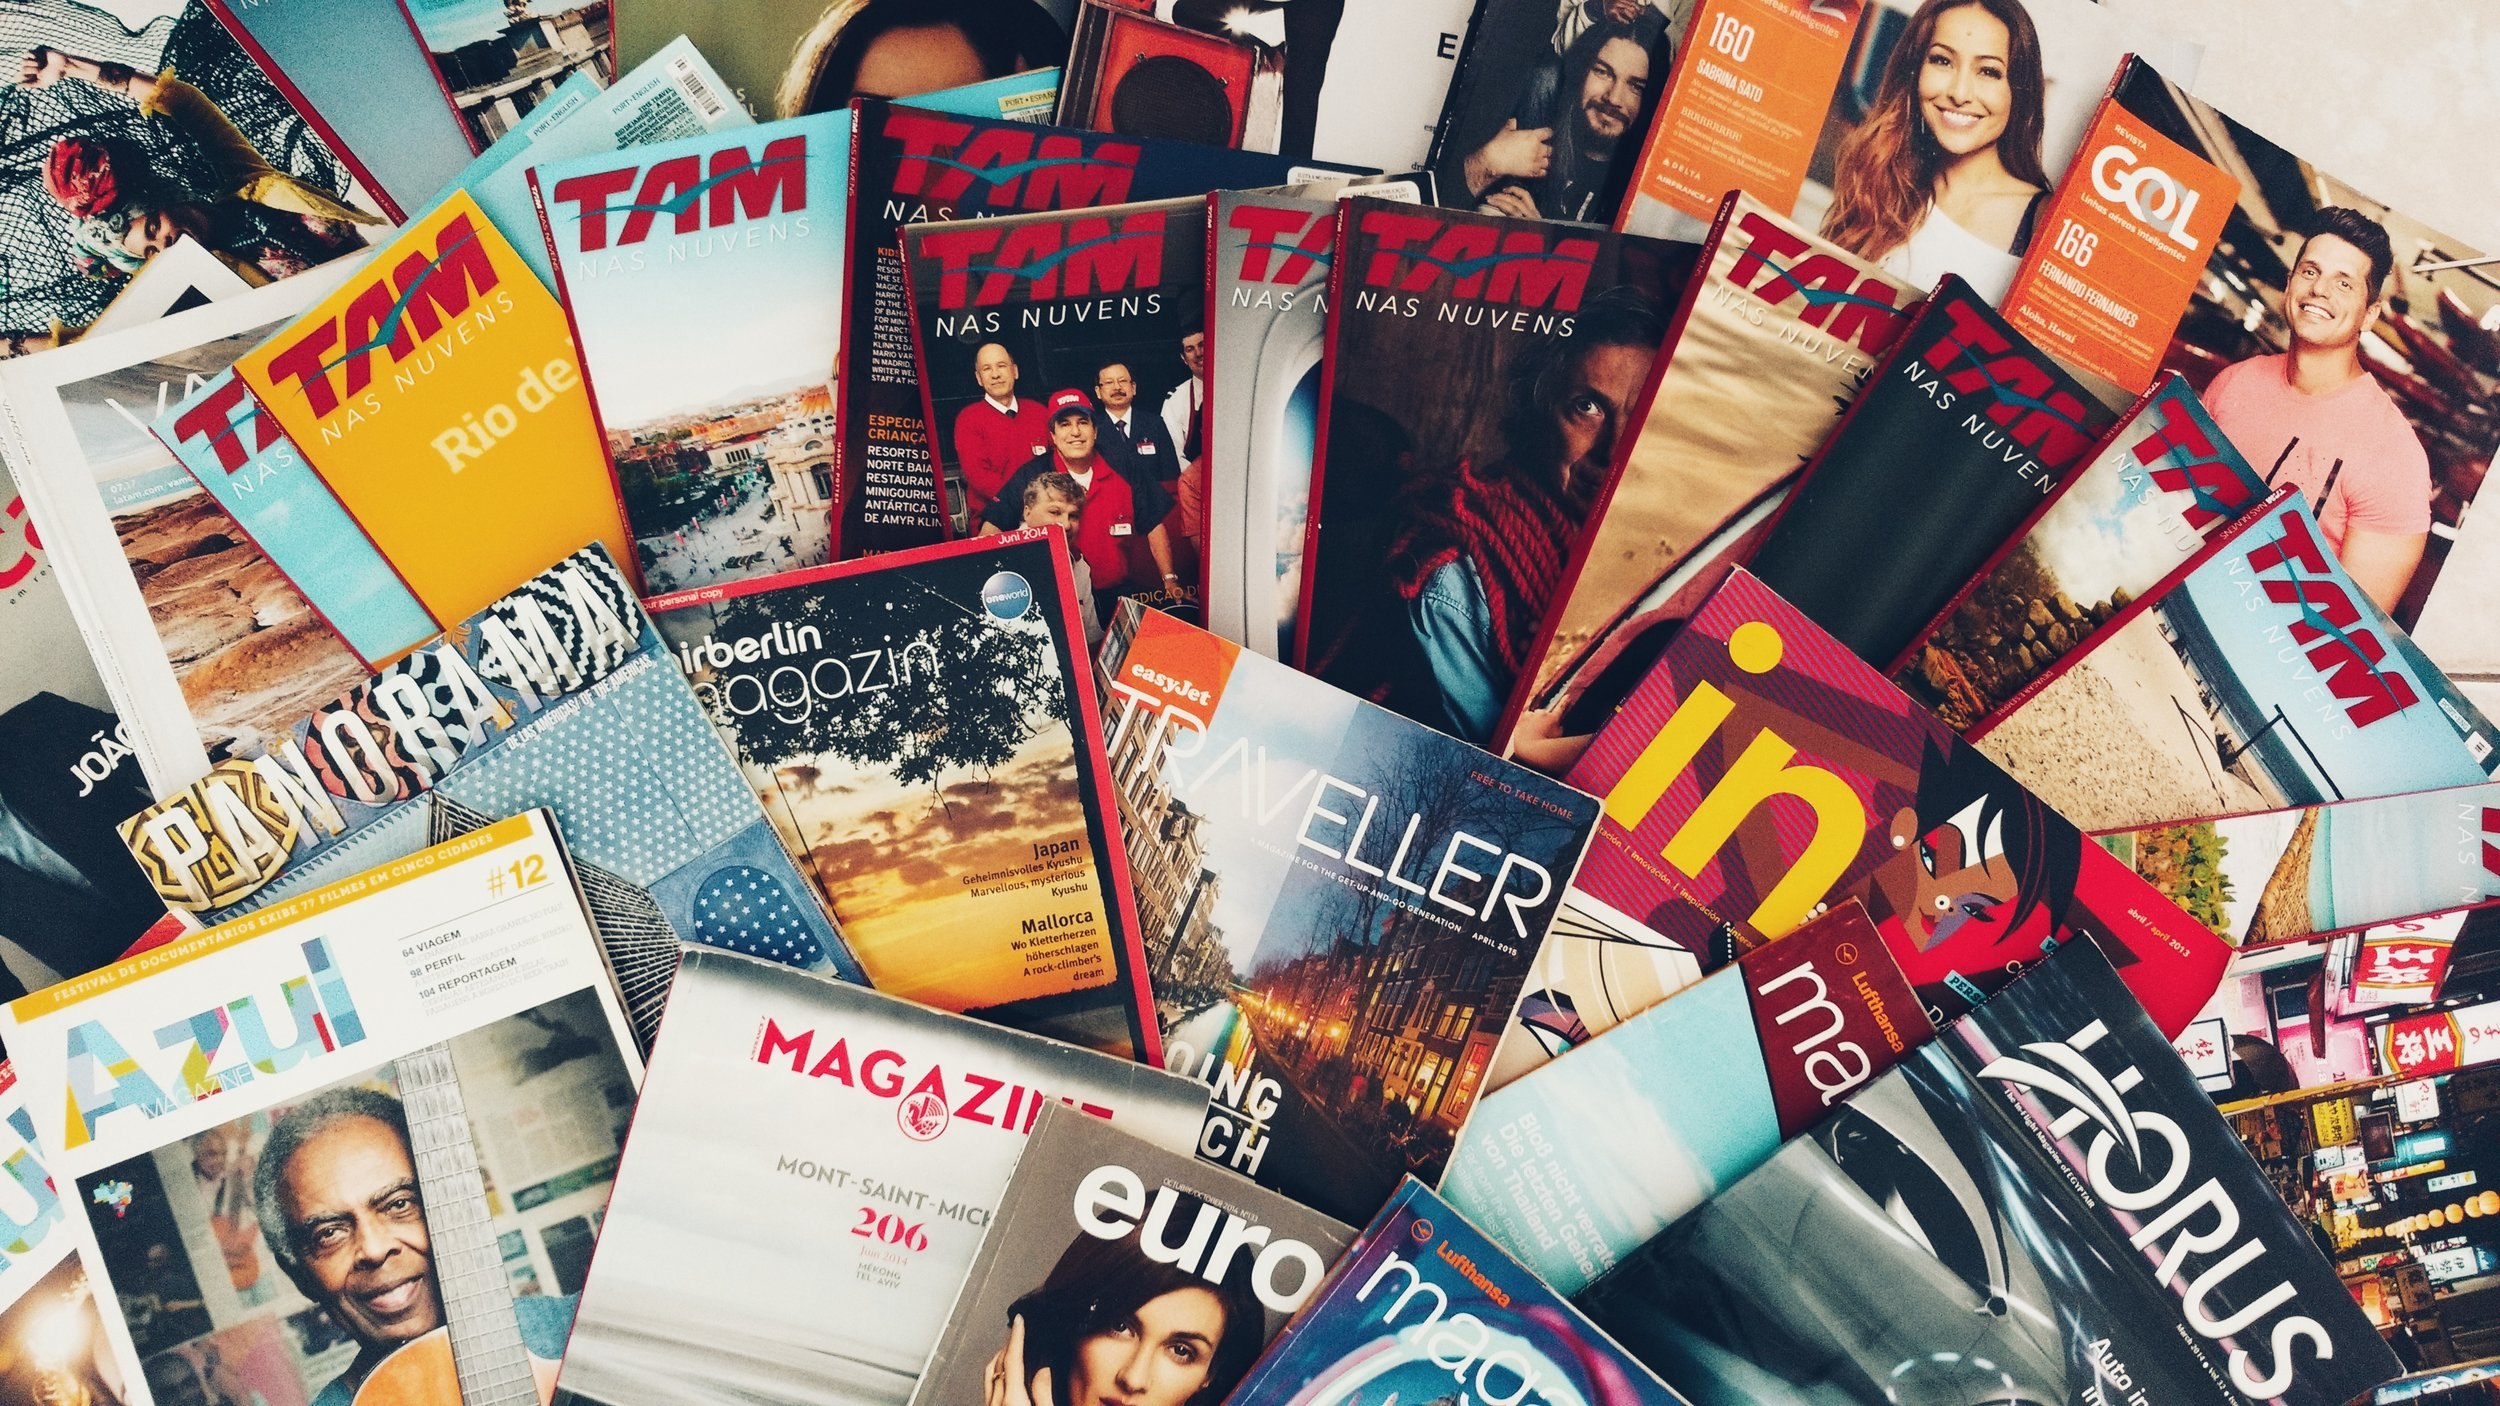 Brochure production - Professional brochure design across a range of industries.